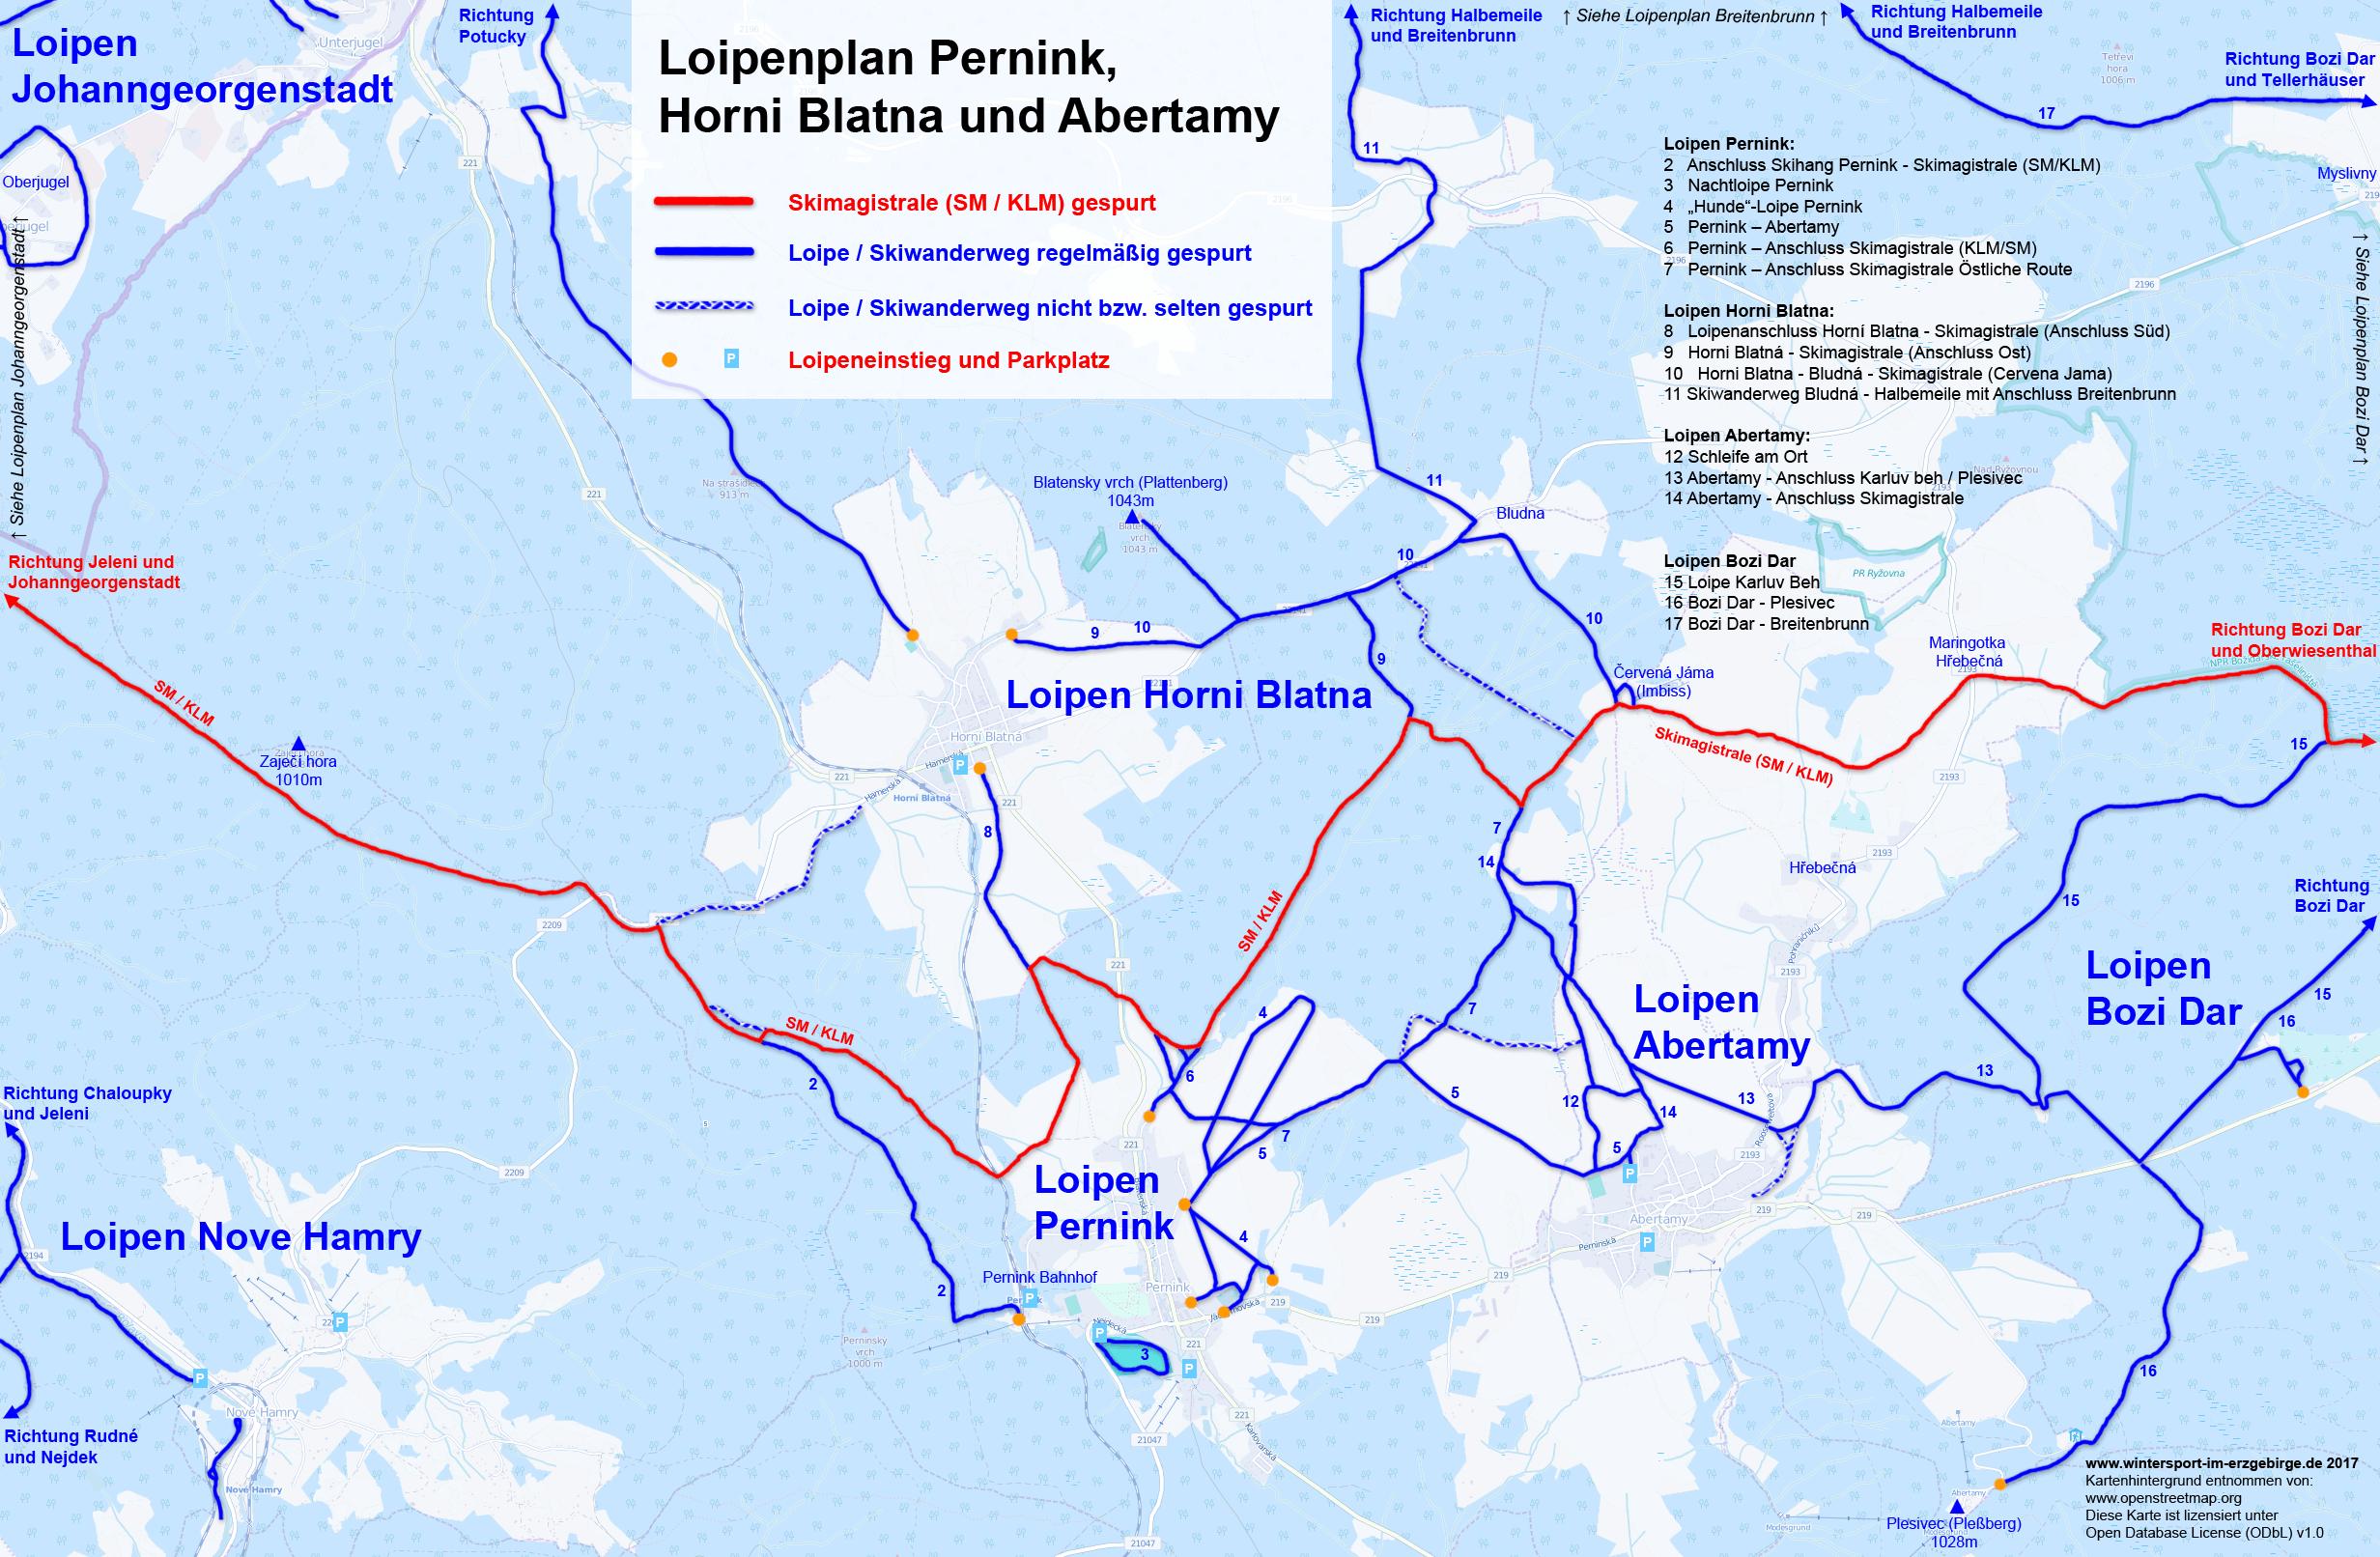 Loipenplan Pernink, Abertamy und Horni Blatna